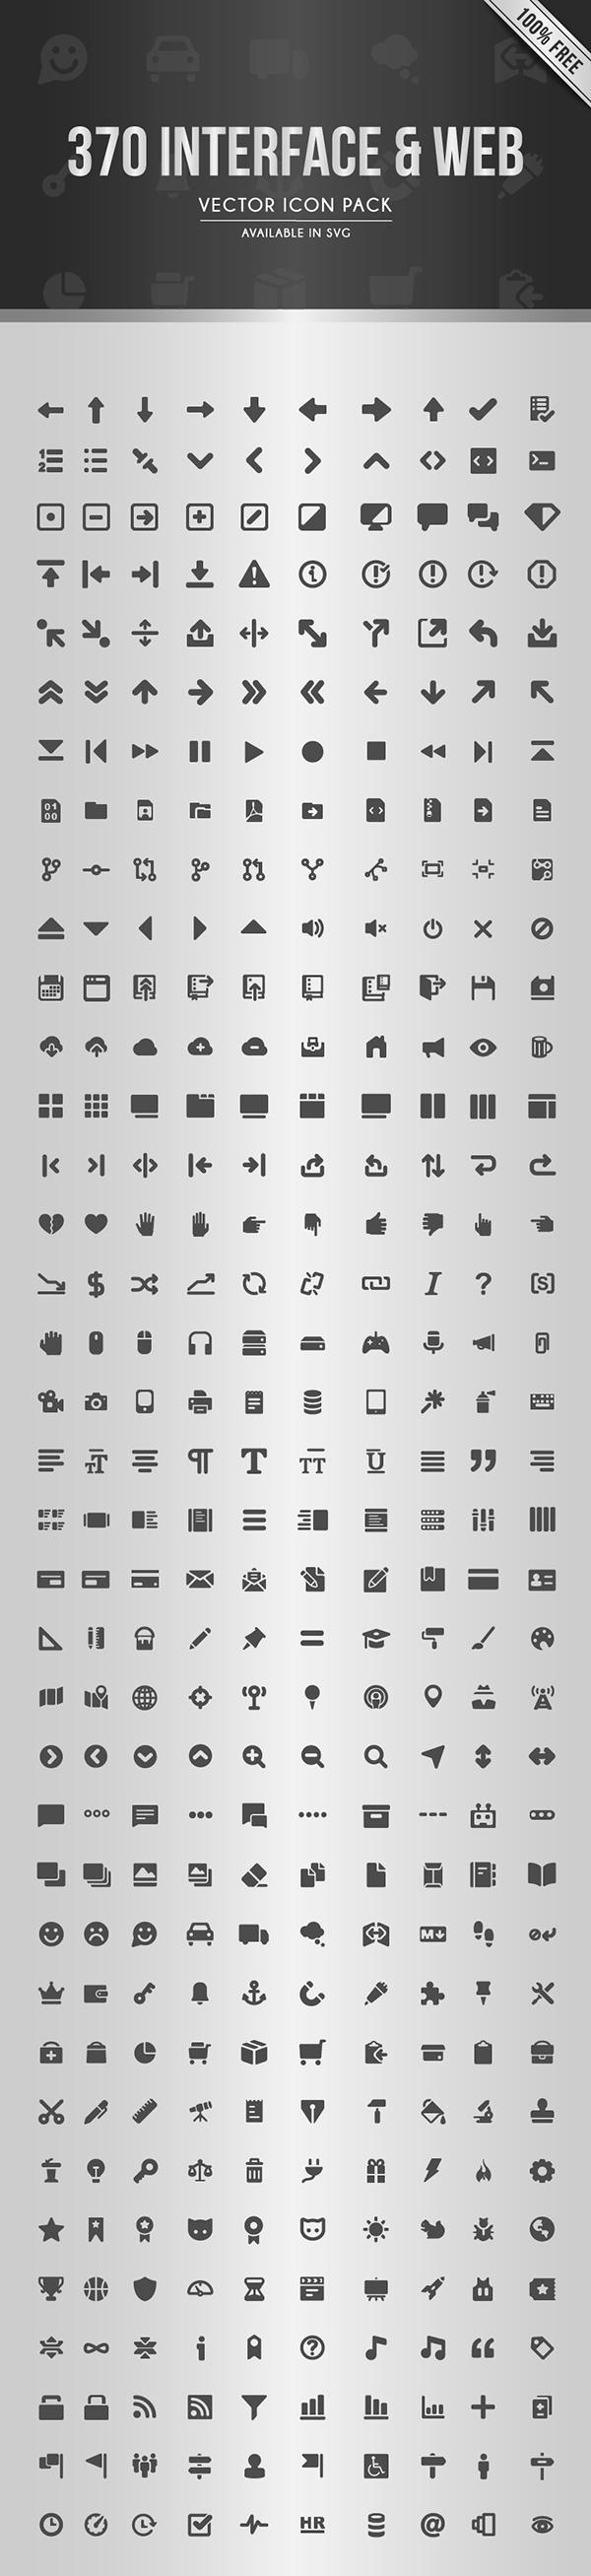 The-Web-Interface-Icon-Set